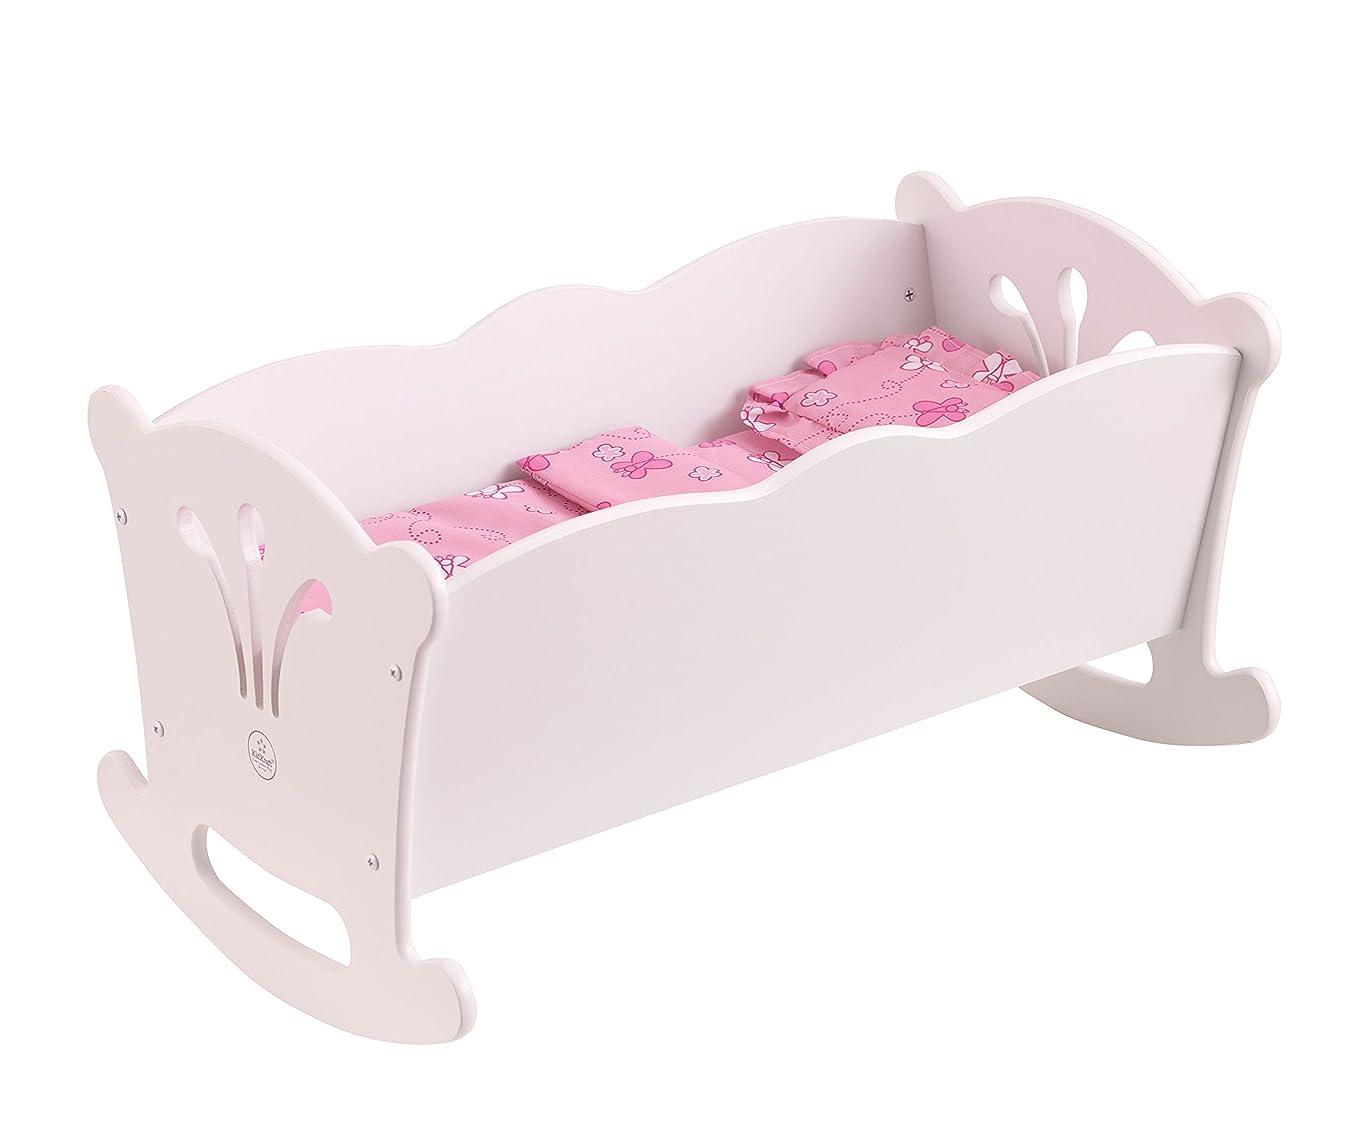 KidKraft Lil' Doll Cradle i51339911